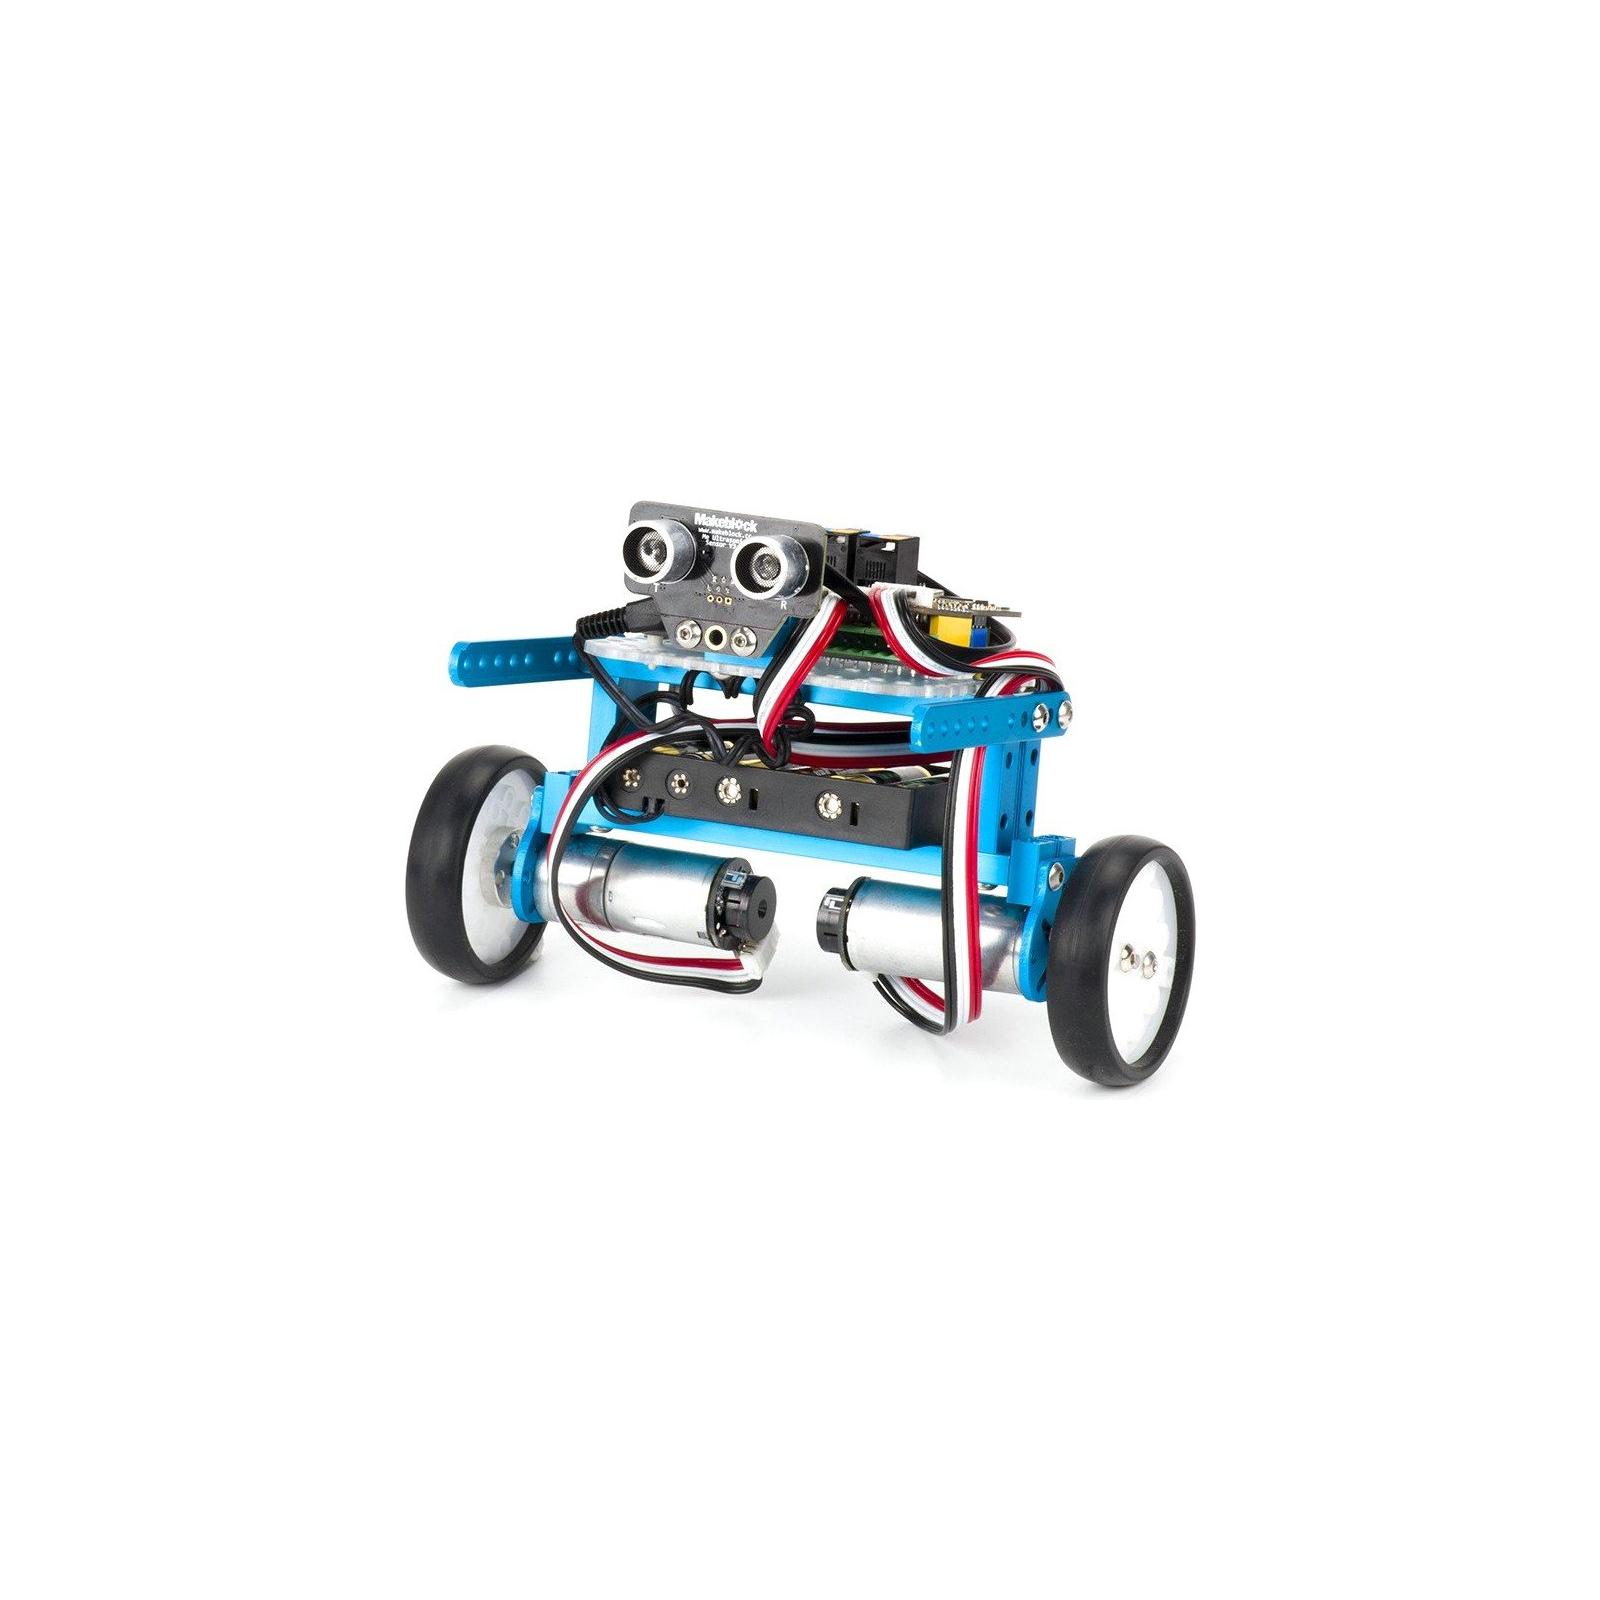 Робот Makeblock Ultimate v2.0 Robot Kit (09.00.40) изображение 6